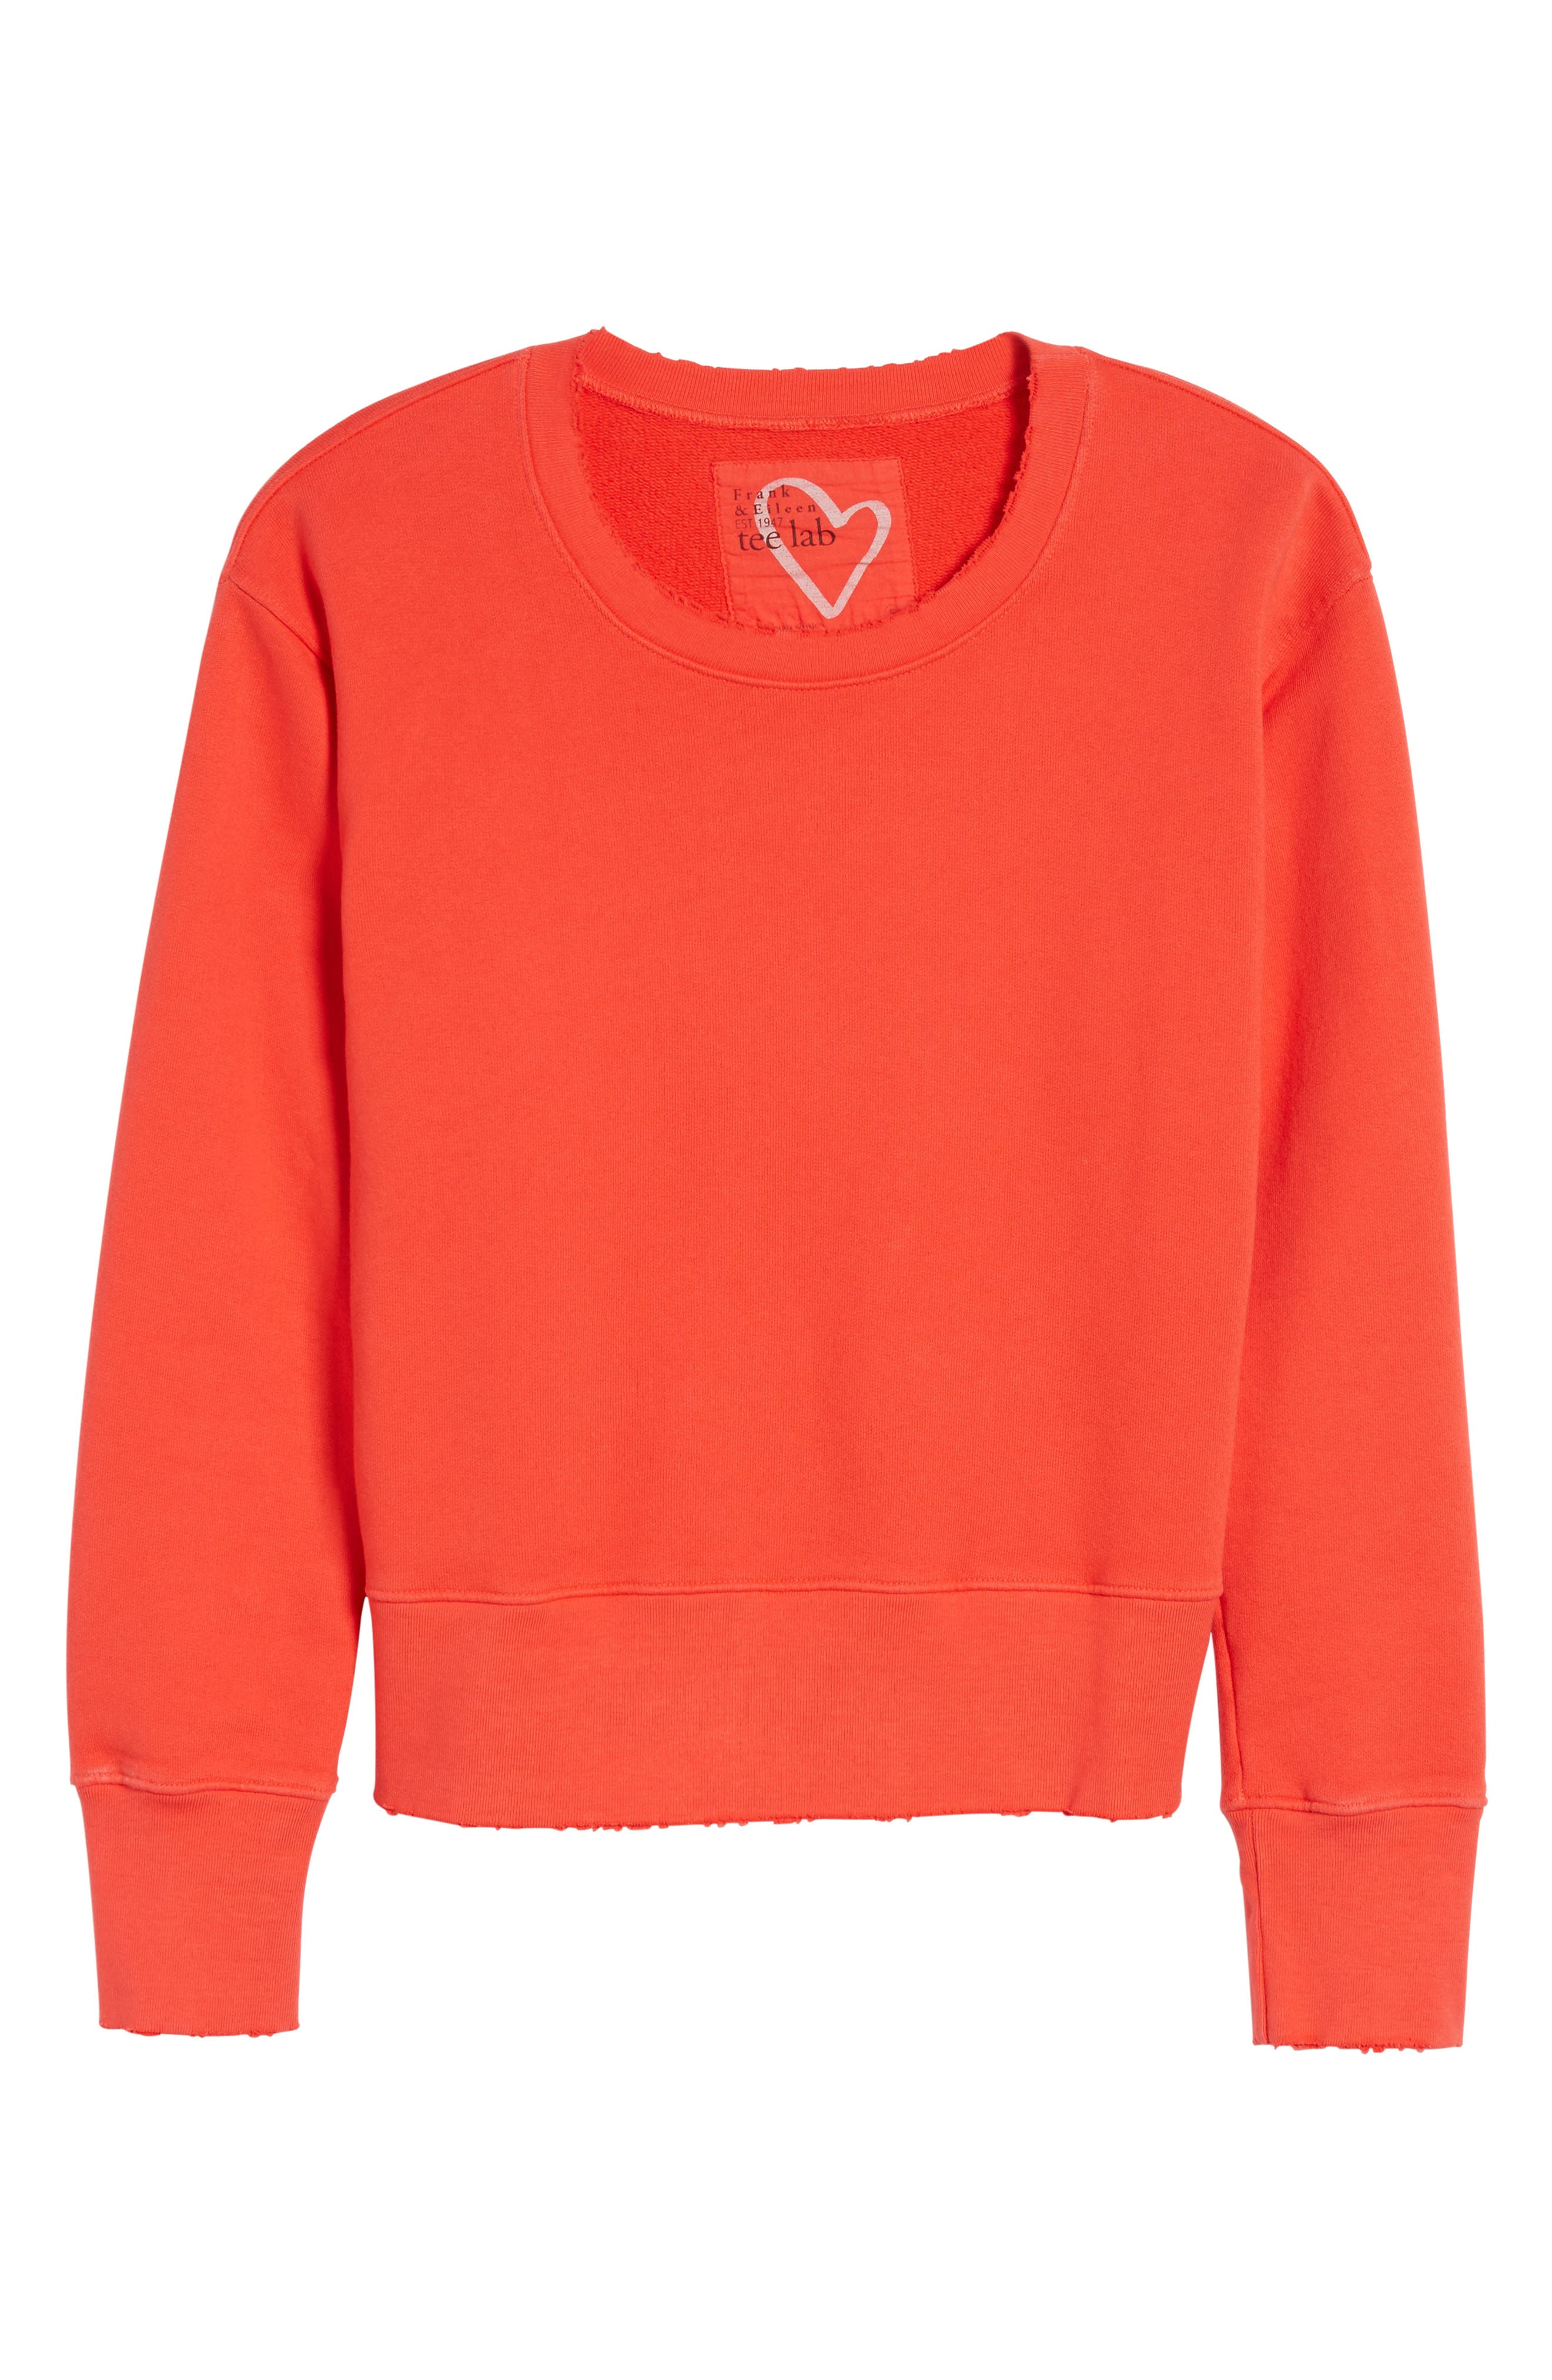 FRANK & EILEEN TEE LAB,                             Distressed Sweatshirt,                             Alternate thumbnail 6, color,                             624